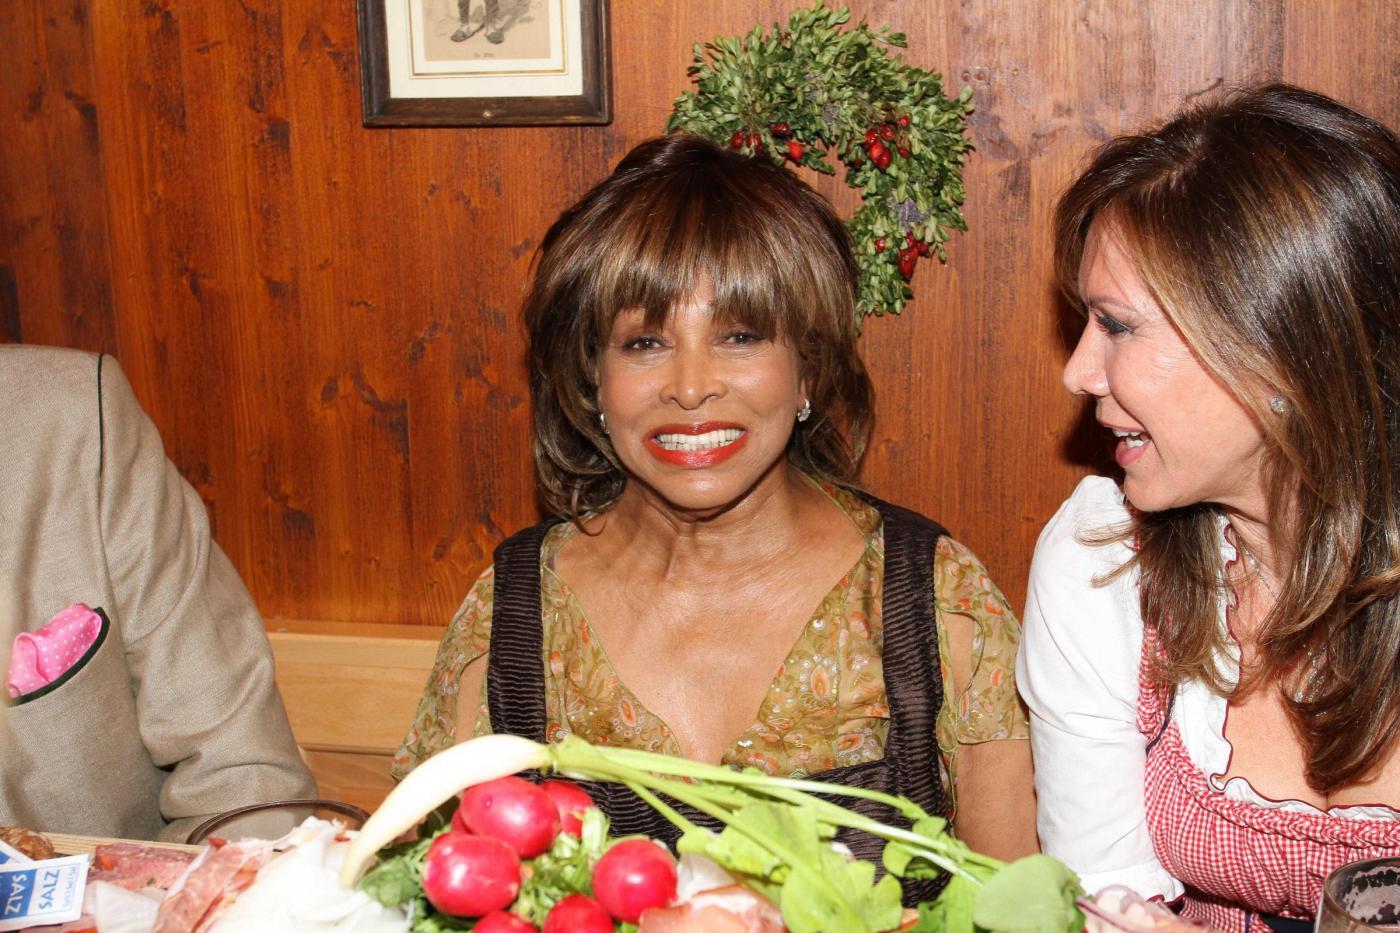 Tina Turner e Usain Bolt all'Oktoberfest: la regina del soul è brilla09